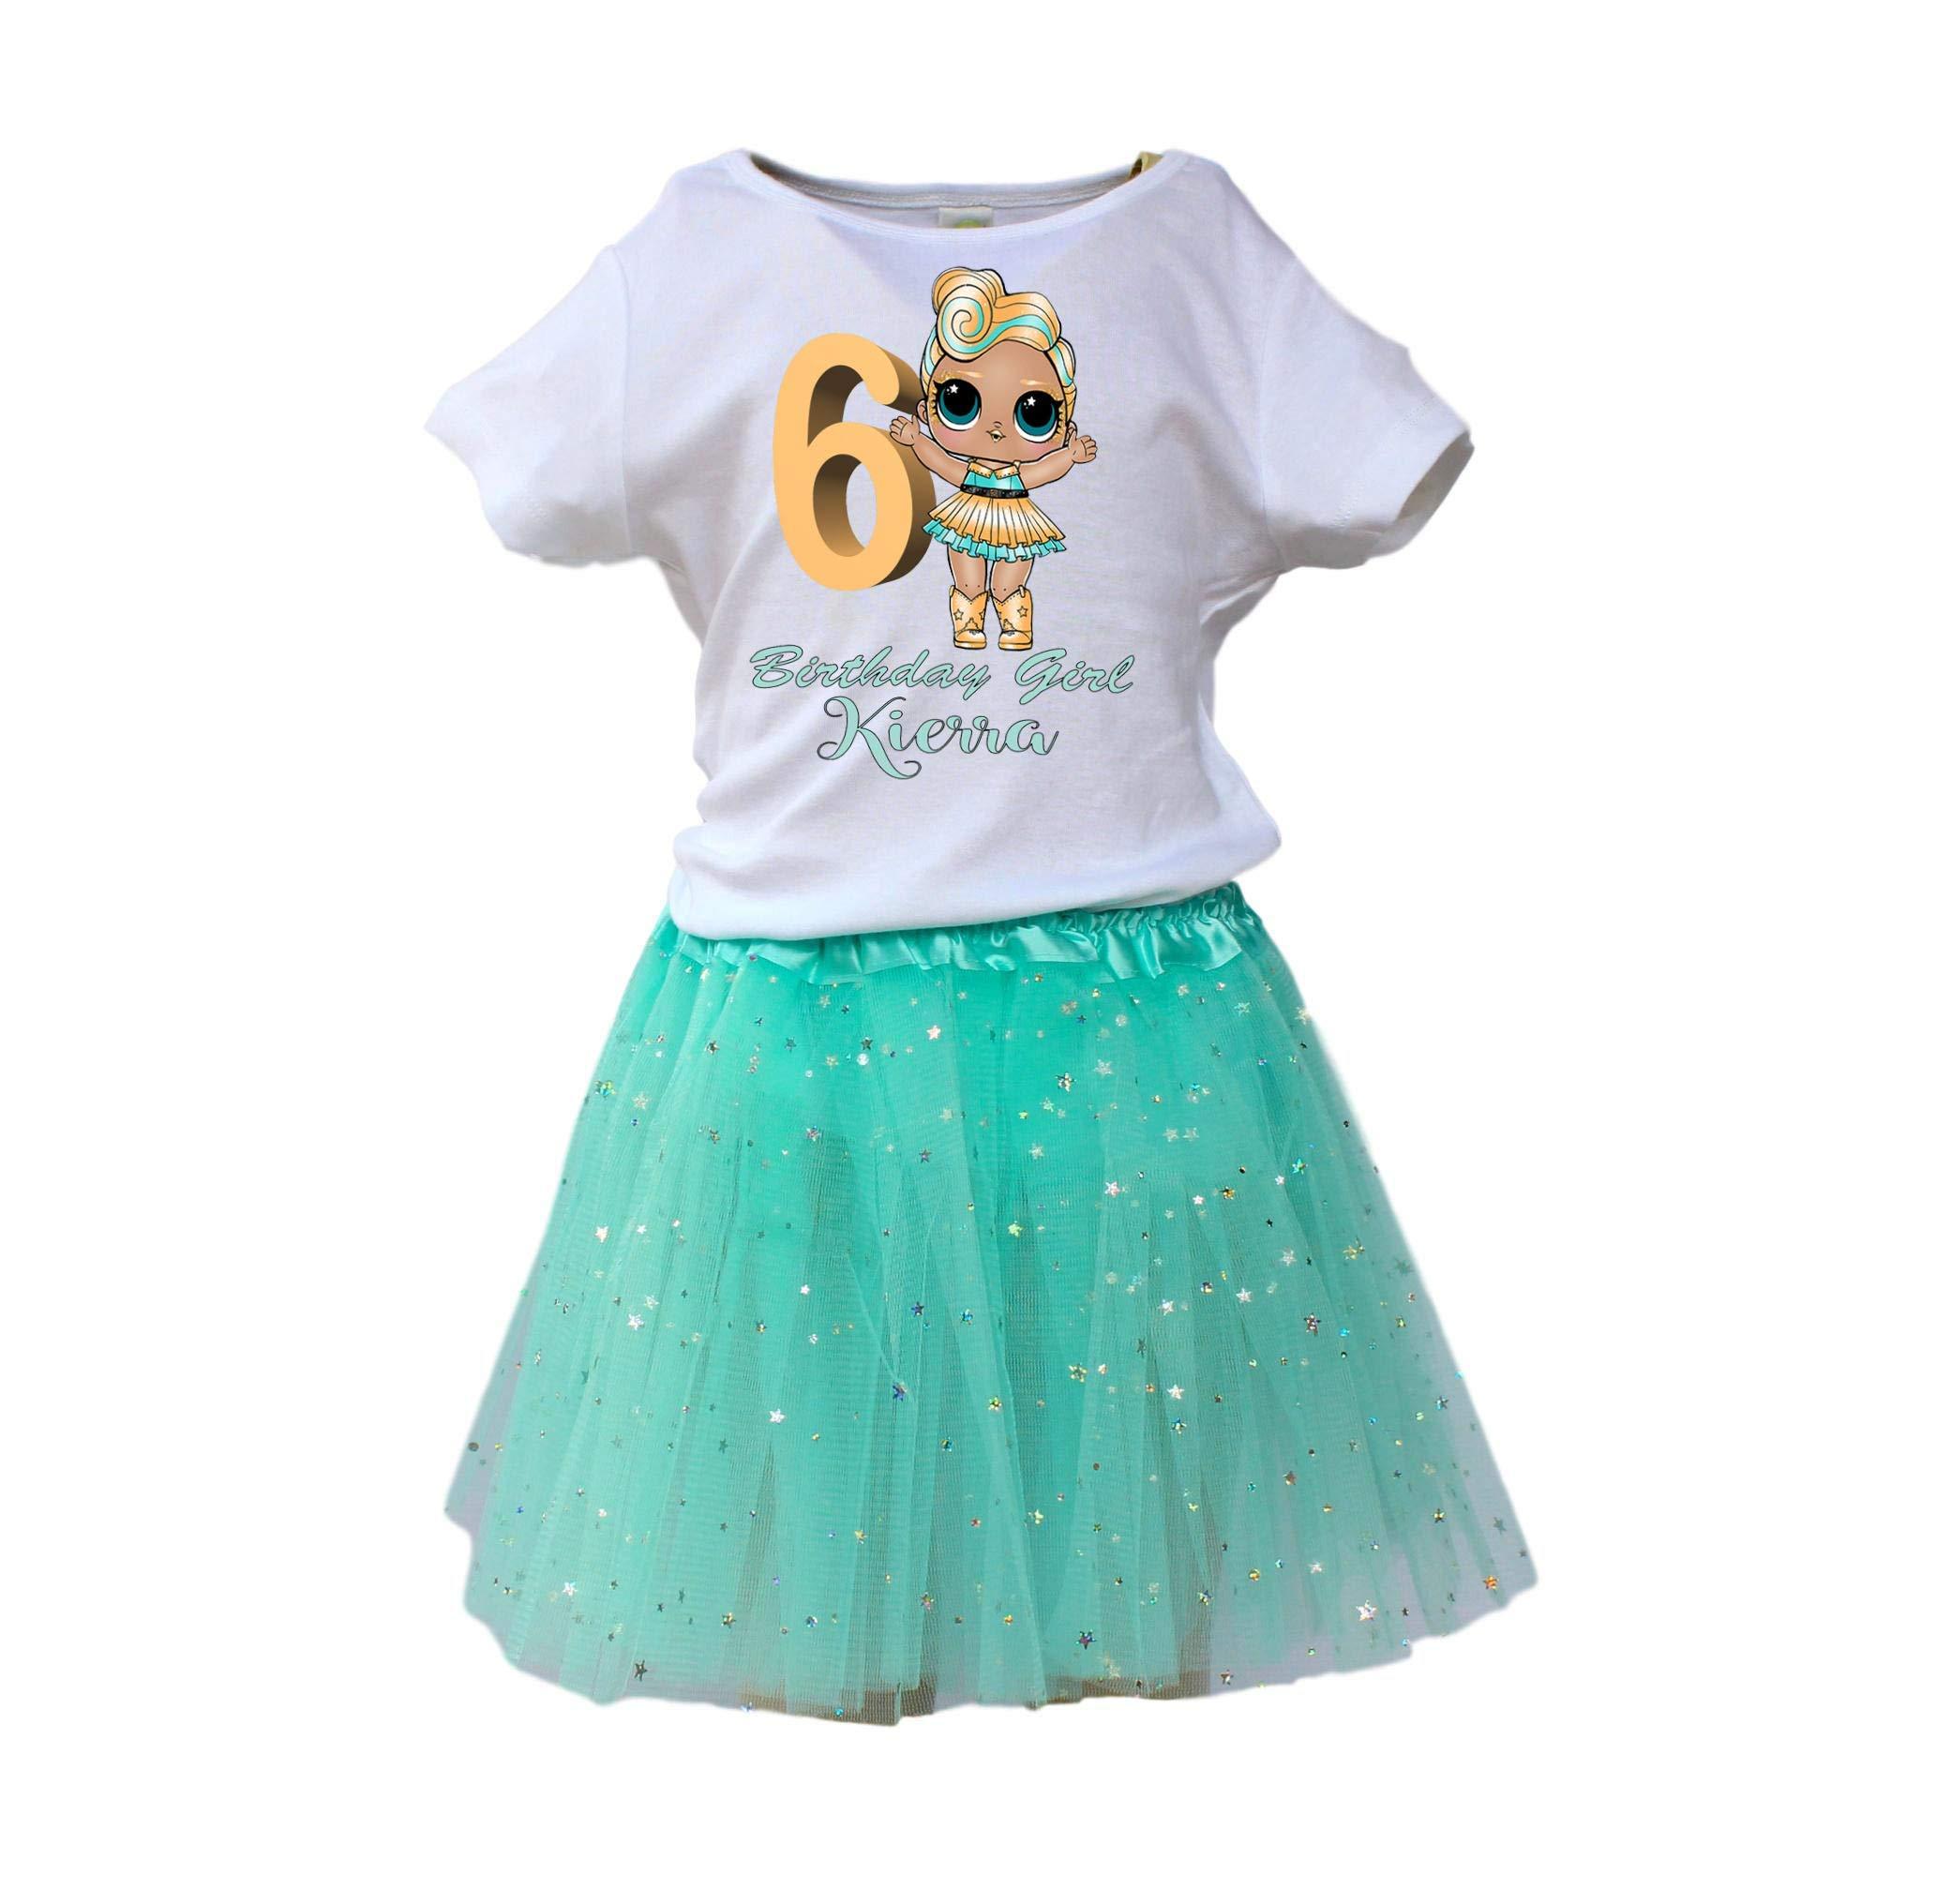 Girl LOL Dolls TUTU birthday outfit Girl LOL age name tutu dress LOL Dolls tutu dress girl tutu by Bele-Creations